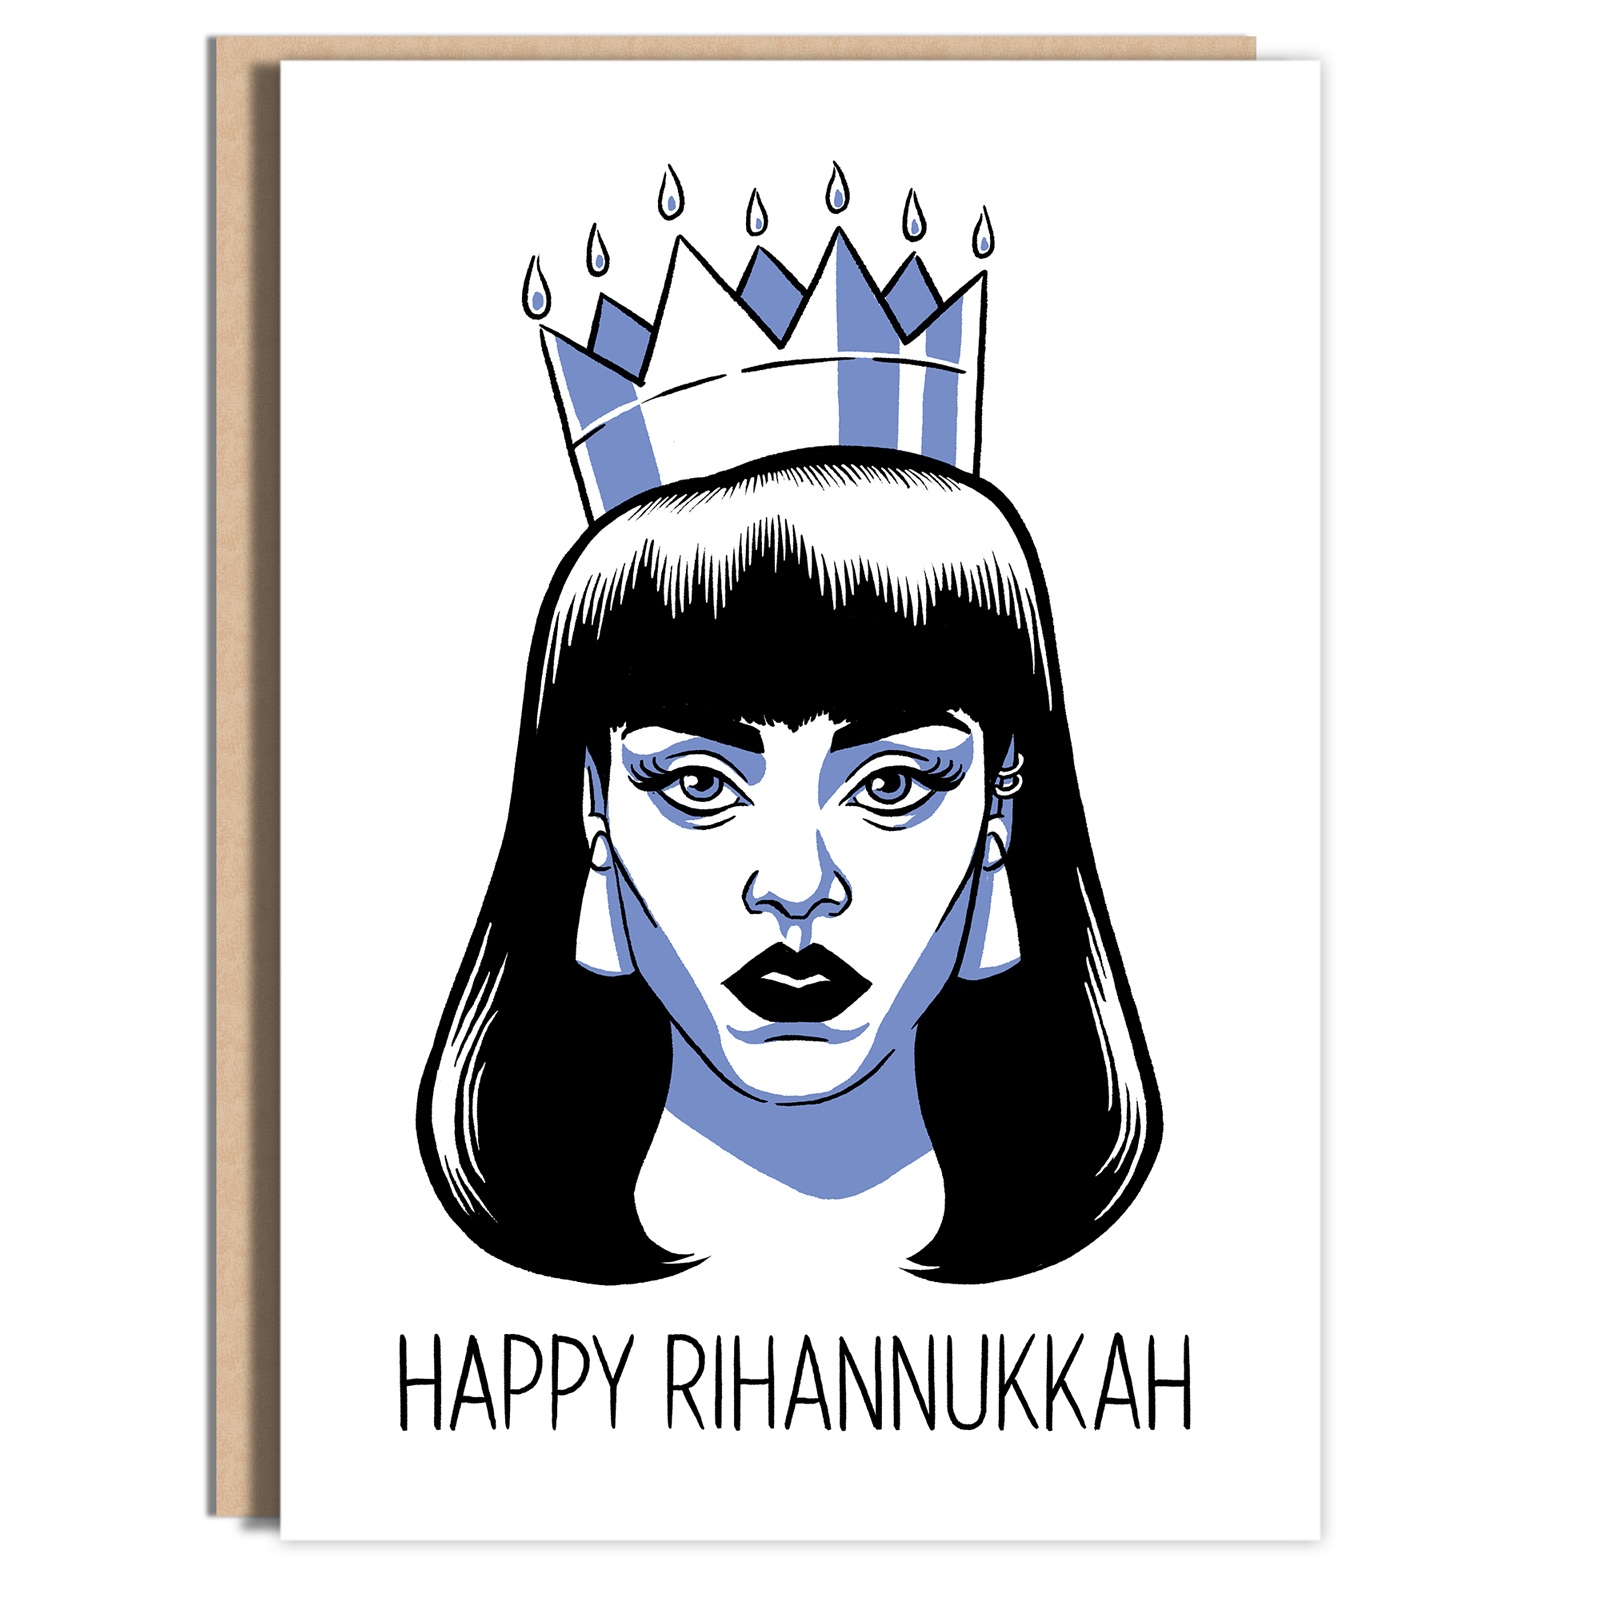 Happy Rihannukkah